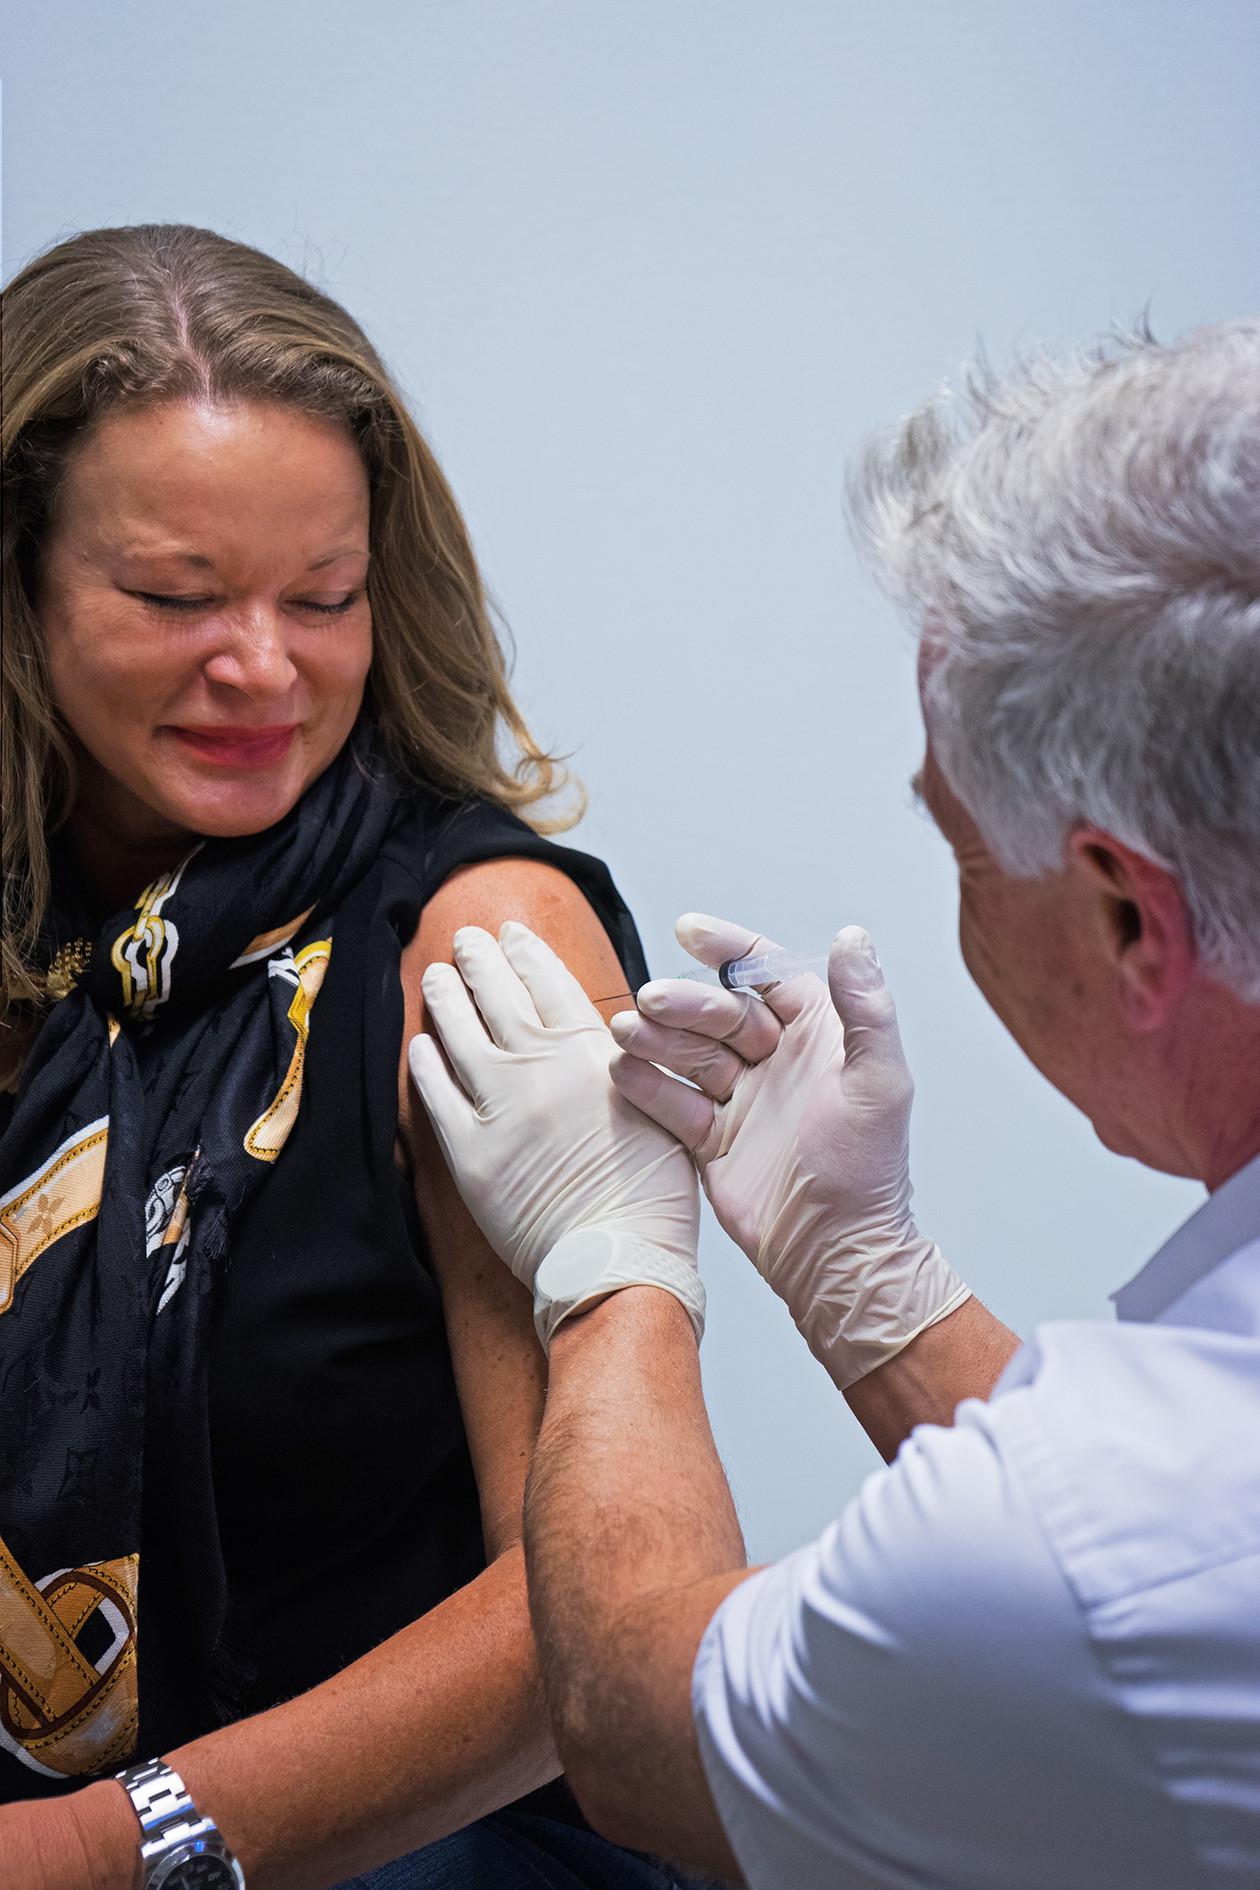 Impfung Zeckenschutz (FSME)